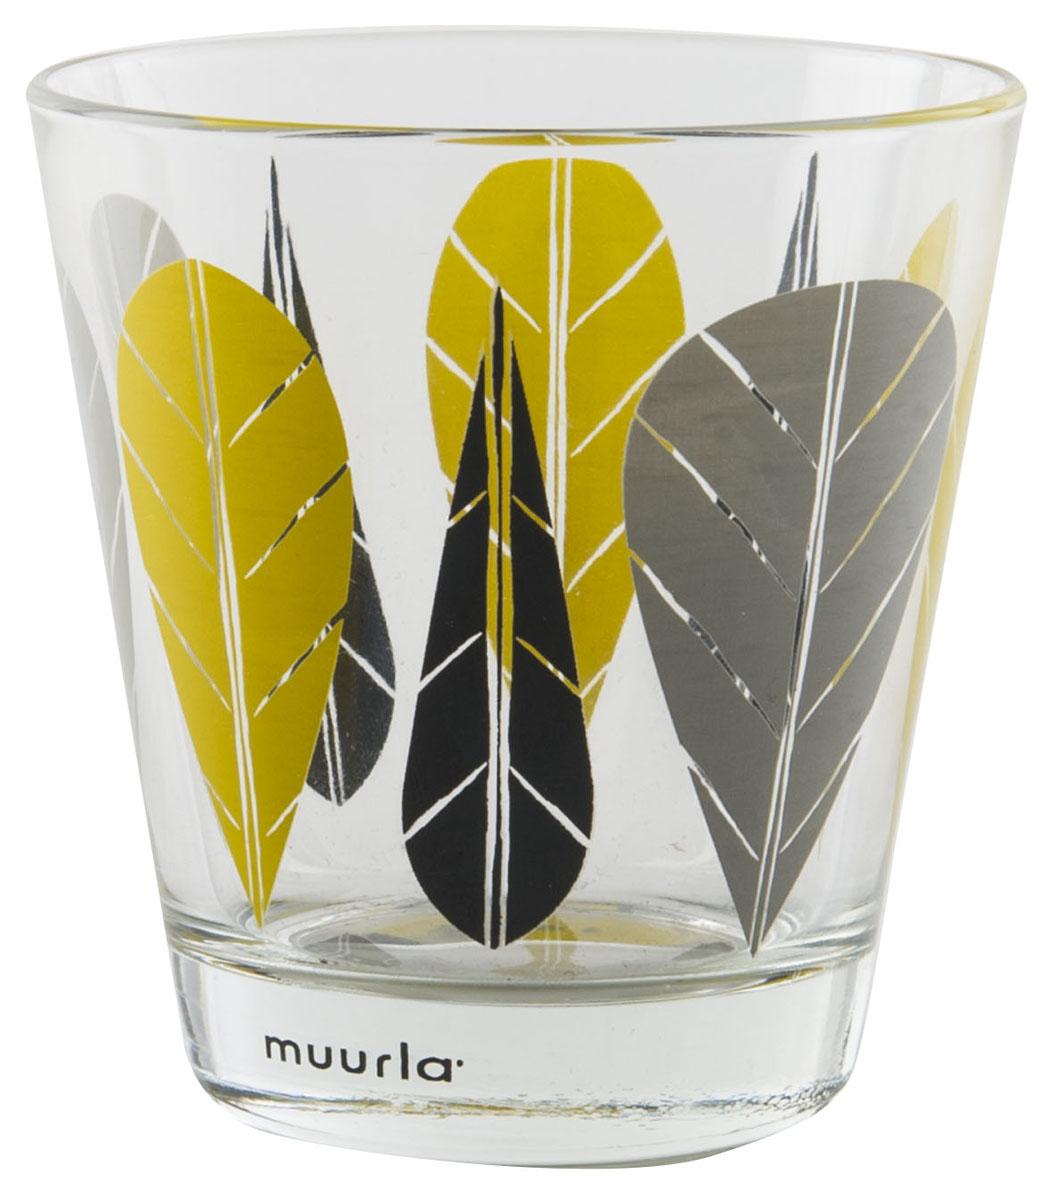 Стакан Muurla Leaves, цвет: прозрачный, 270 мл, 2 шт308-027-02